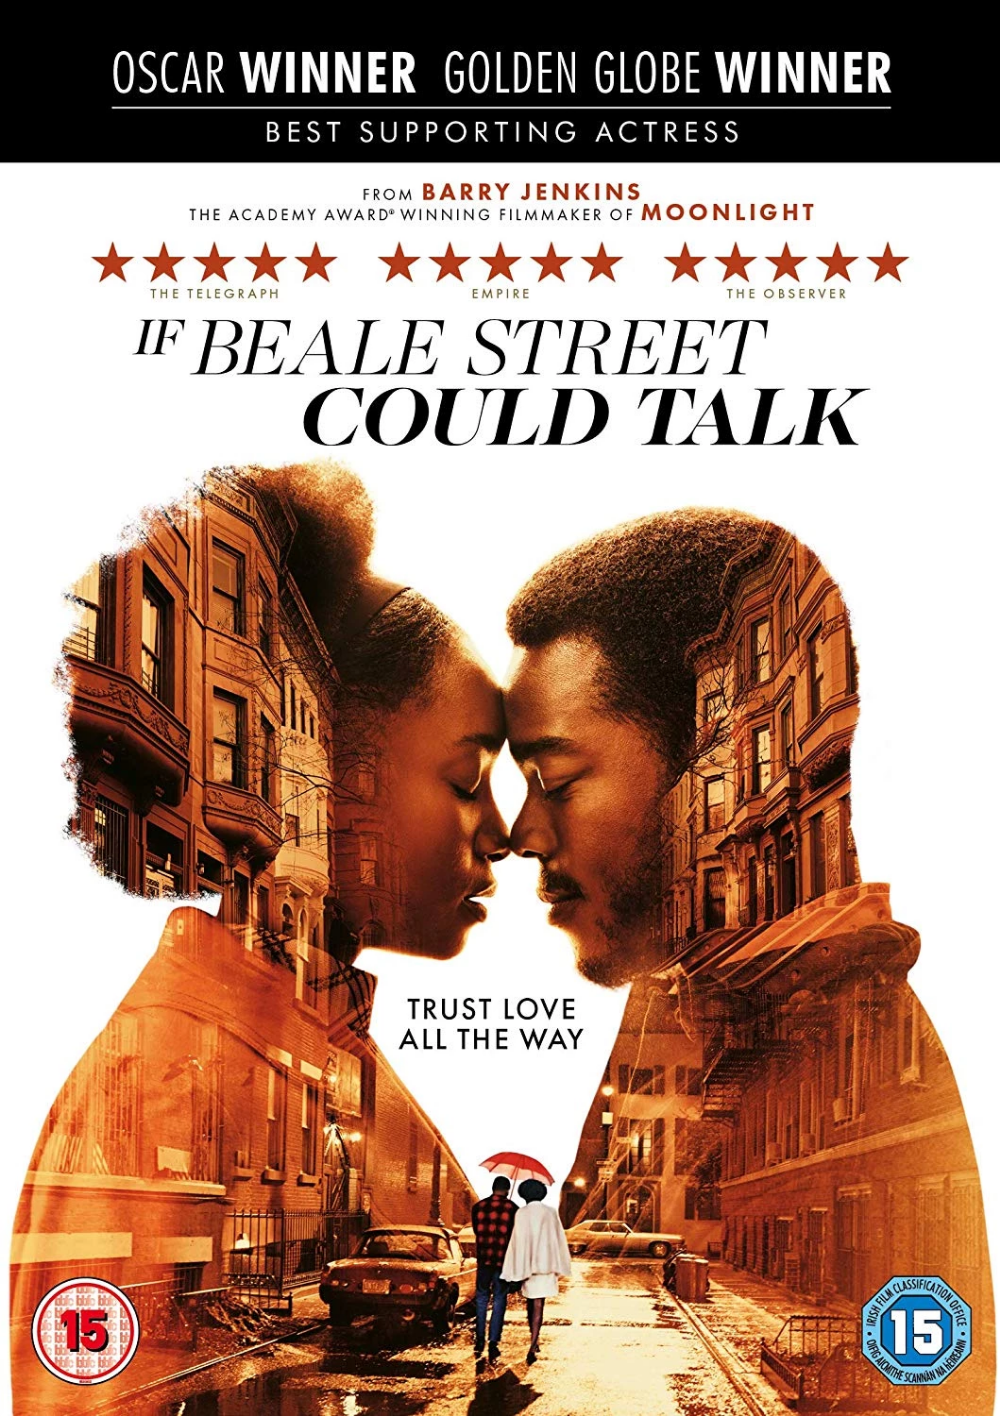 If Beale Street Could Talk Movie Poster Photo 8x10 11x17 16x20 22x28 24x36 27x40